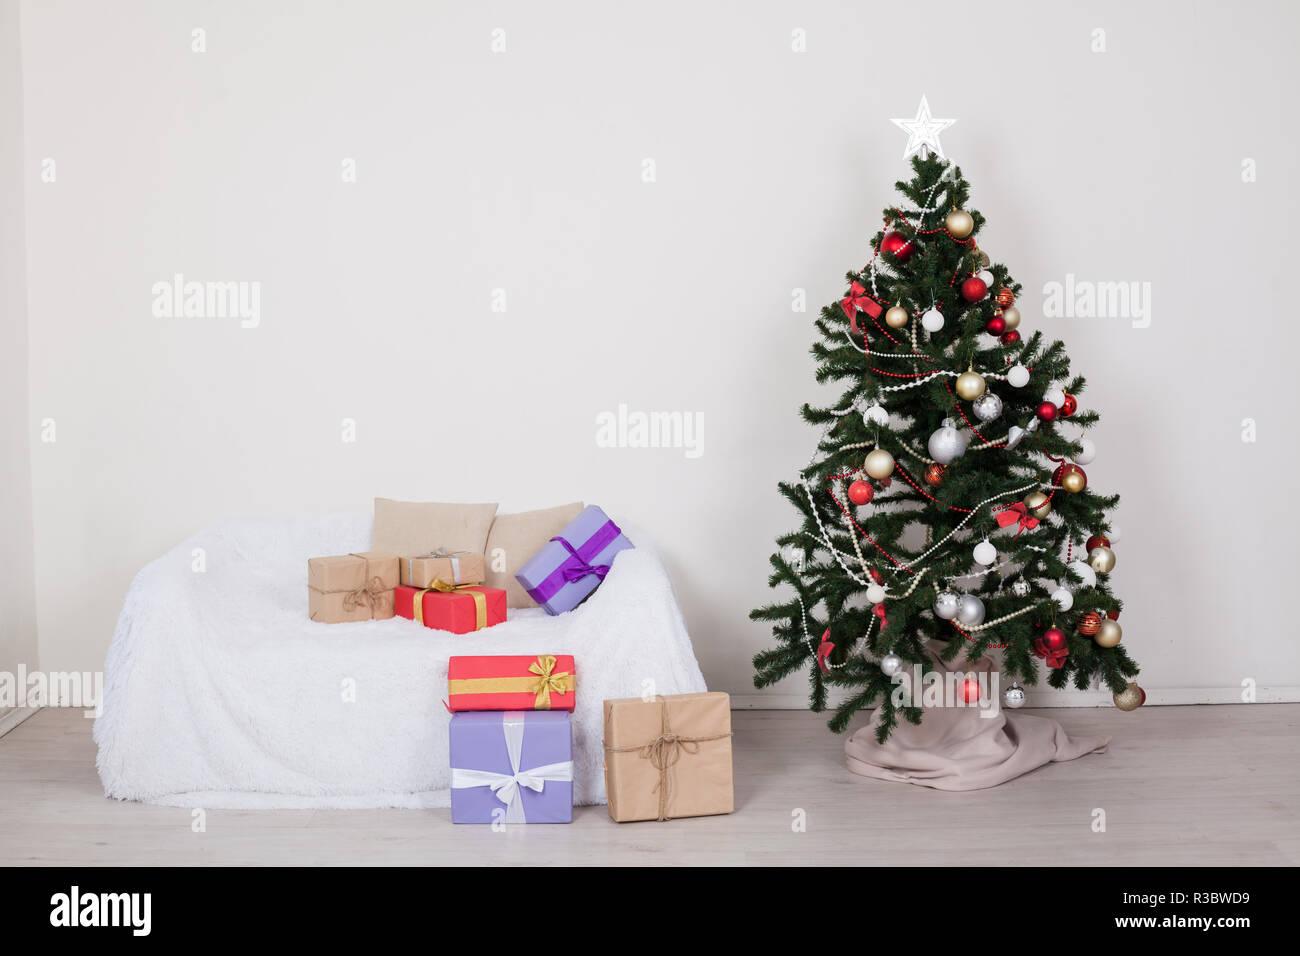 Unusual Christmas Tree Stock Photos & Unusual Christmas Tree Stock ...